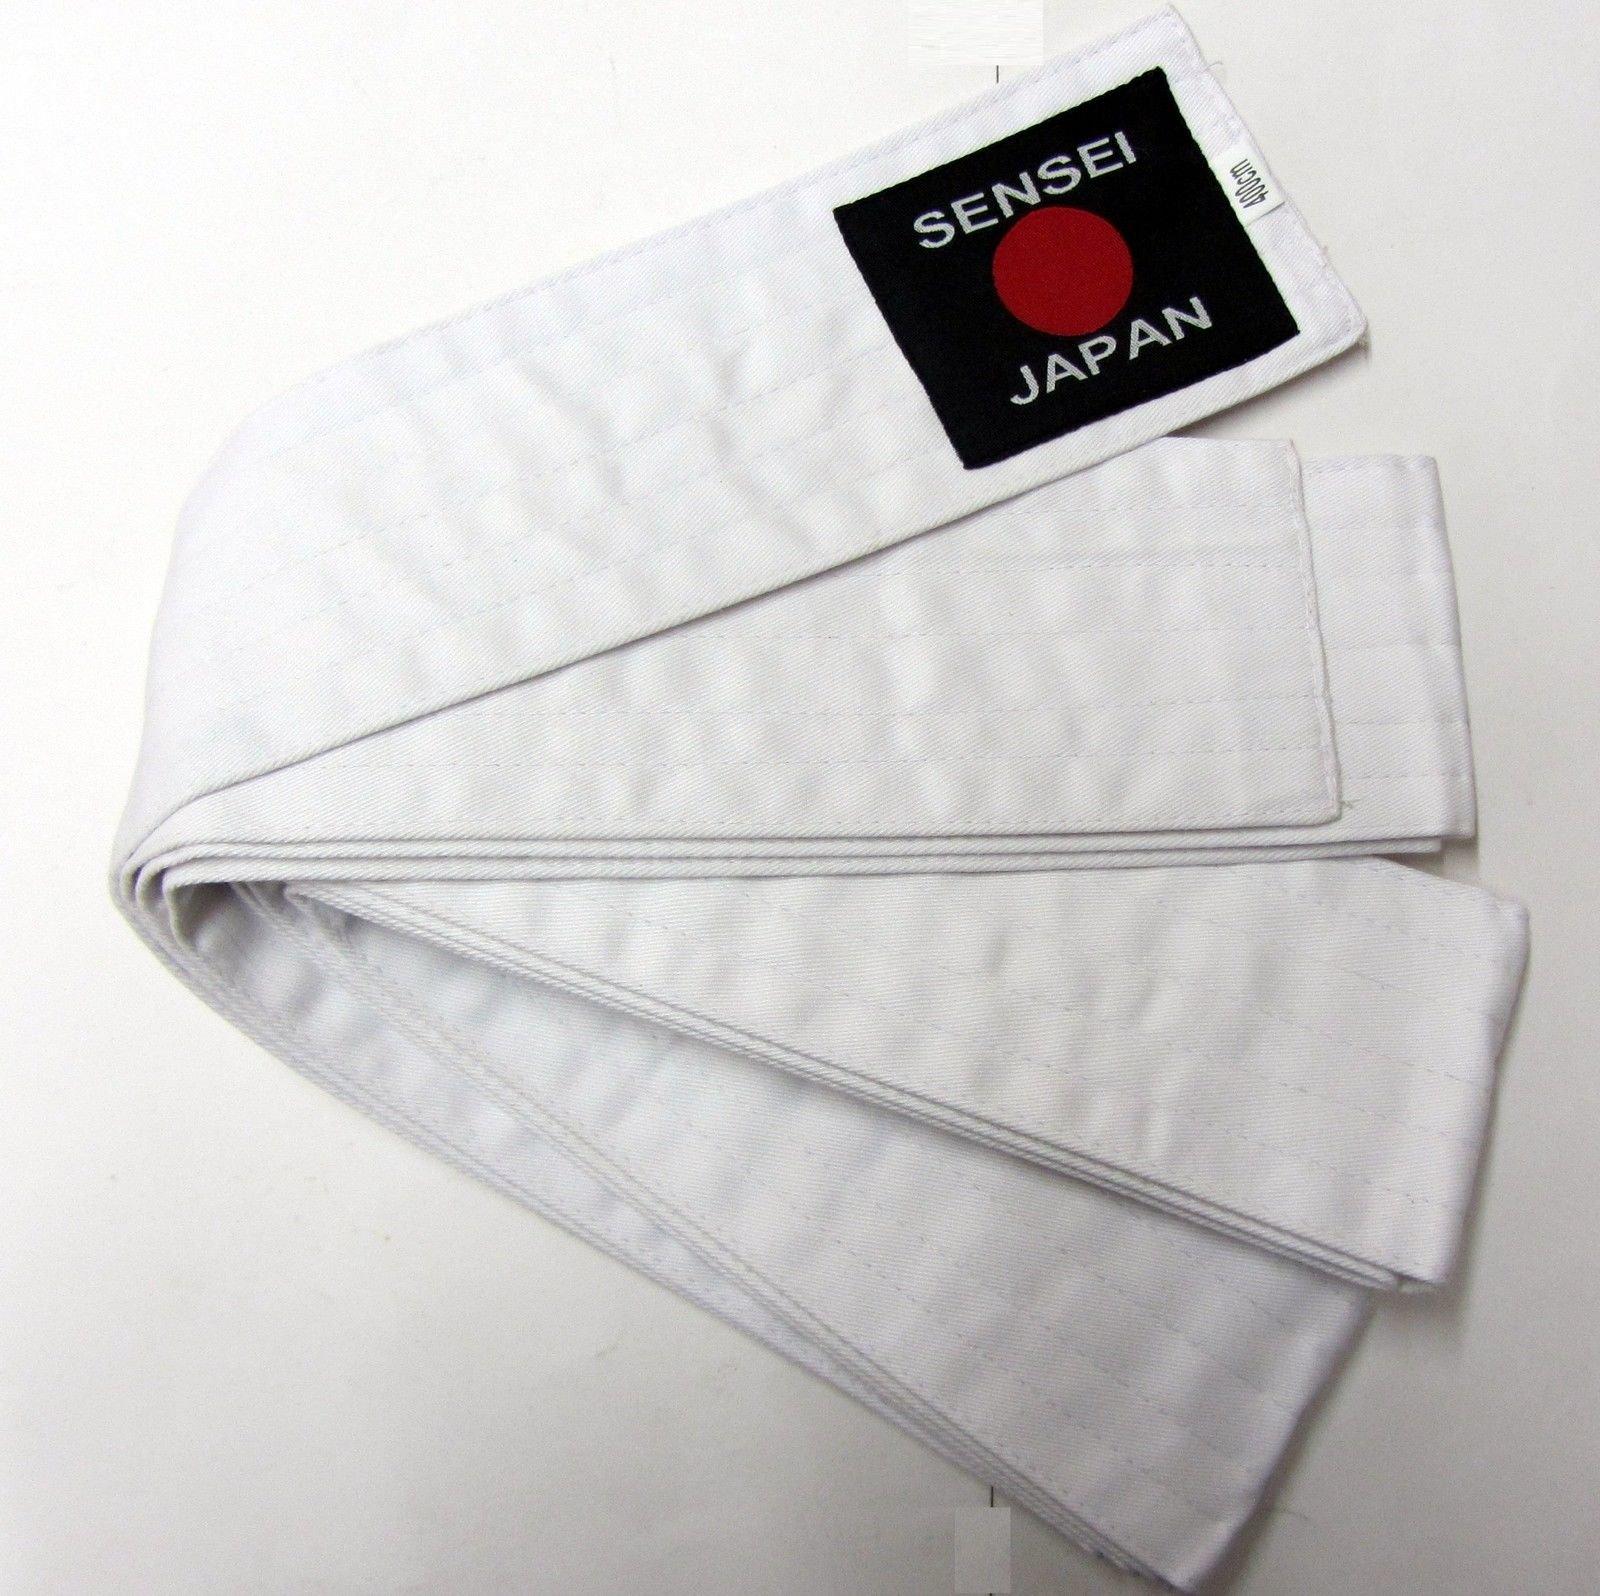 Obi Laido KENDO,AIKIDO Belt WHITE Sensei - 400x8cm Soft Obi 6 Row Stitching Easy Tie